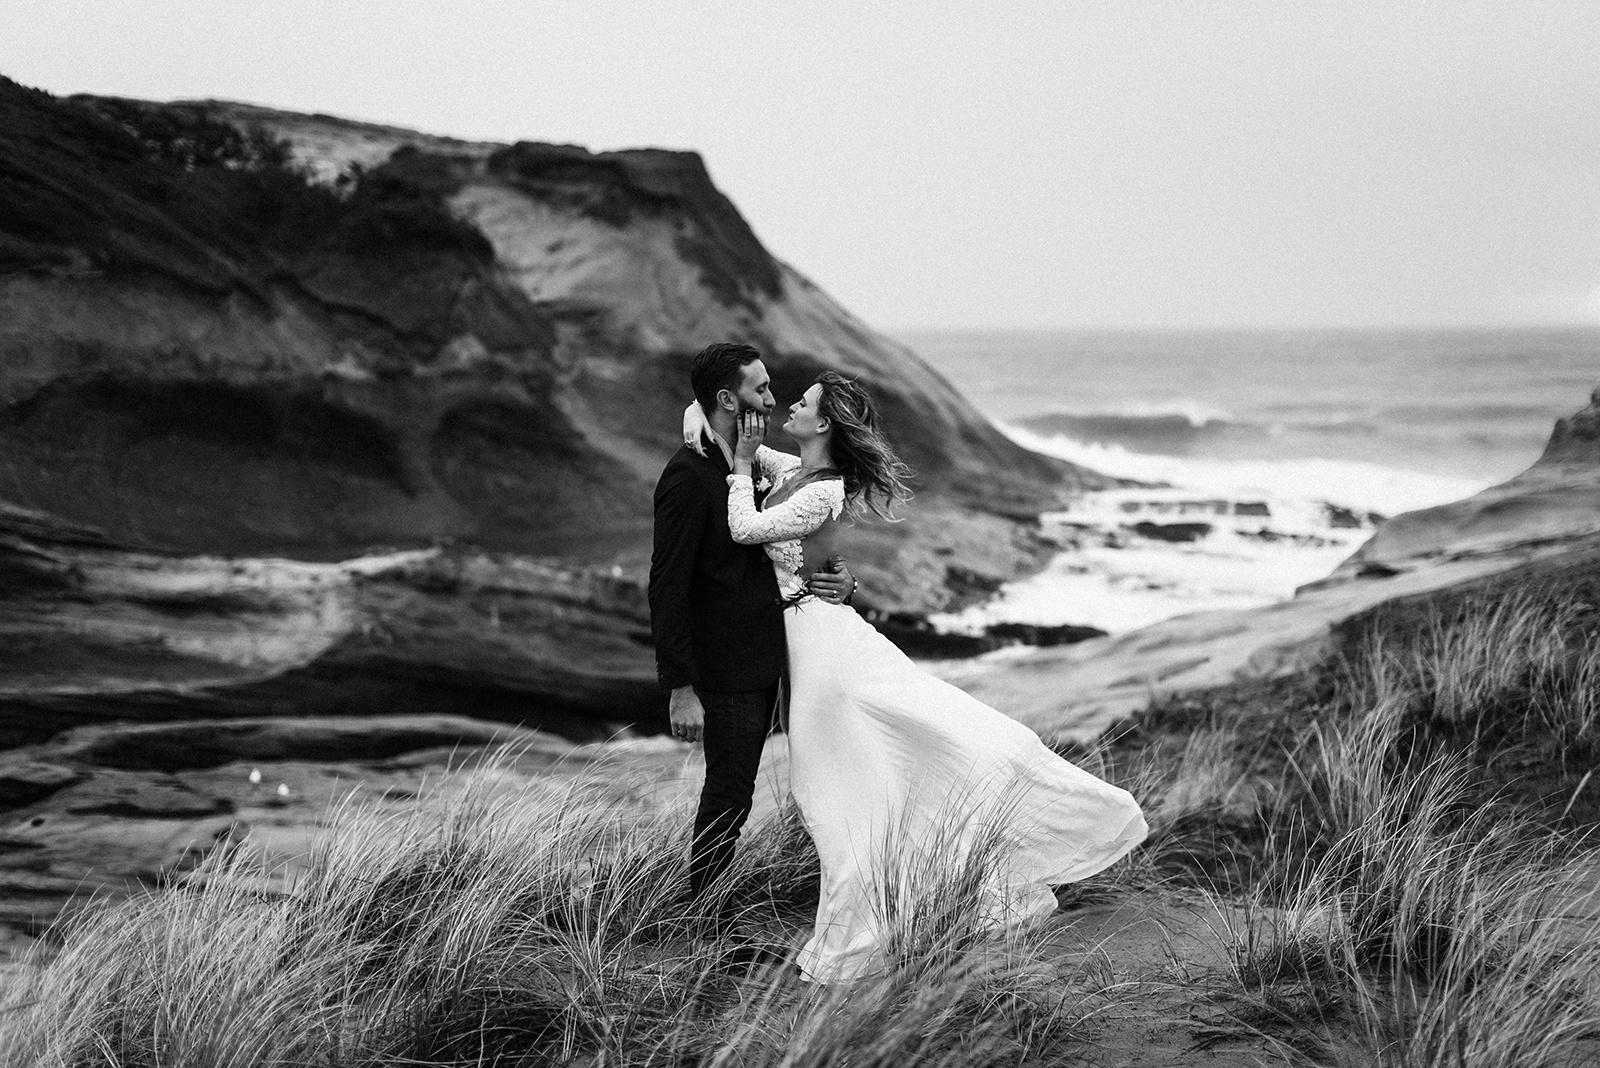 Oregon_Coast_Elopement_Wedding_The_Foxes_Photography_110.jpg